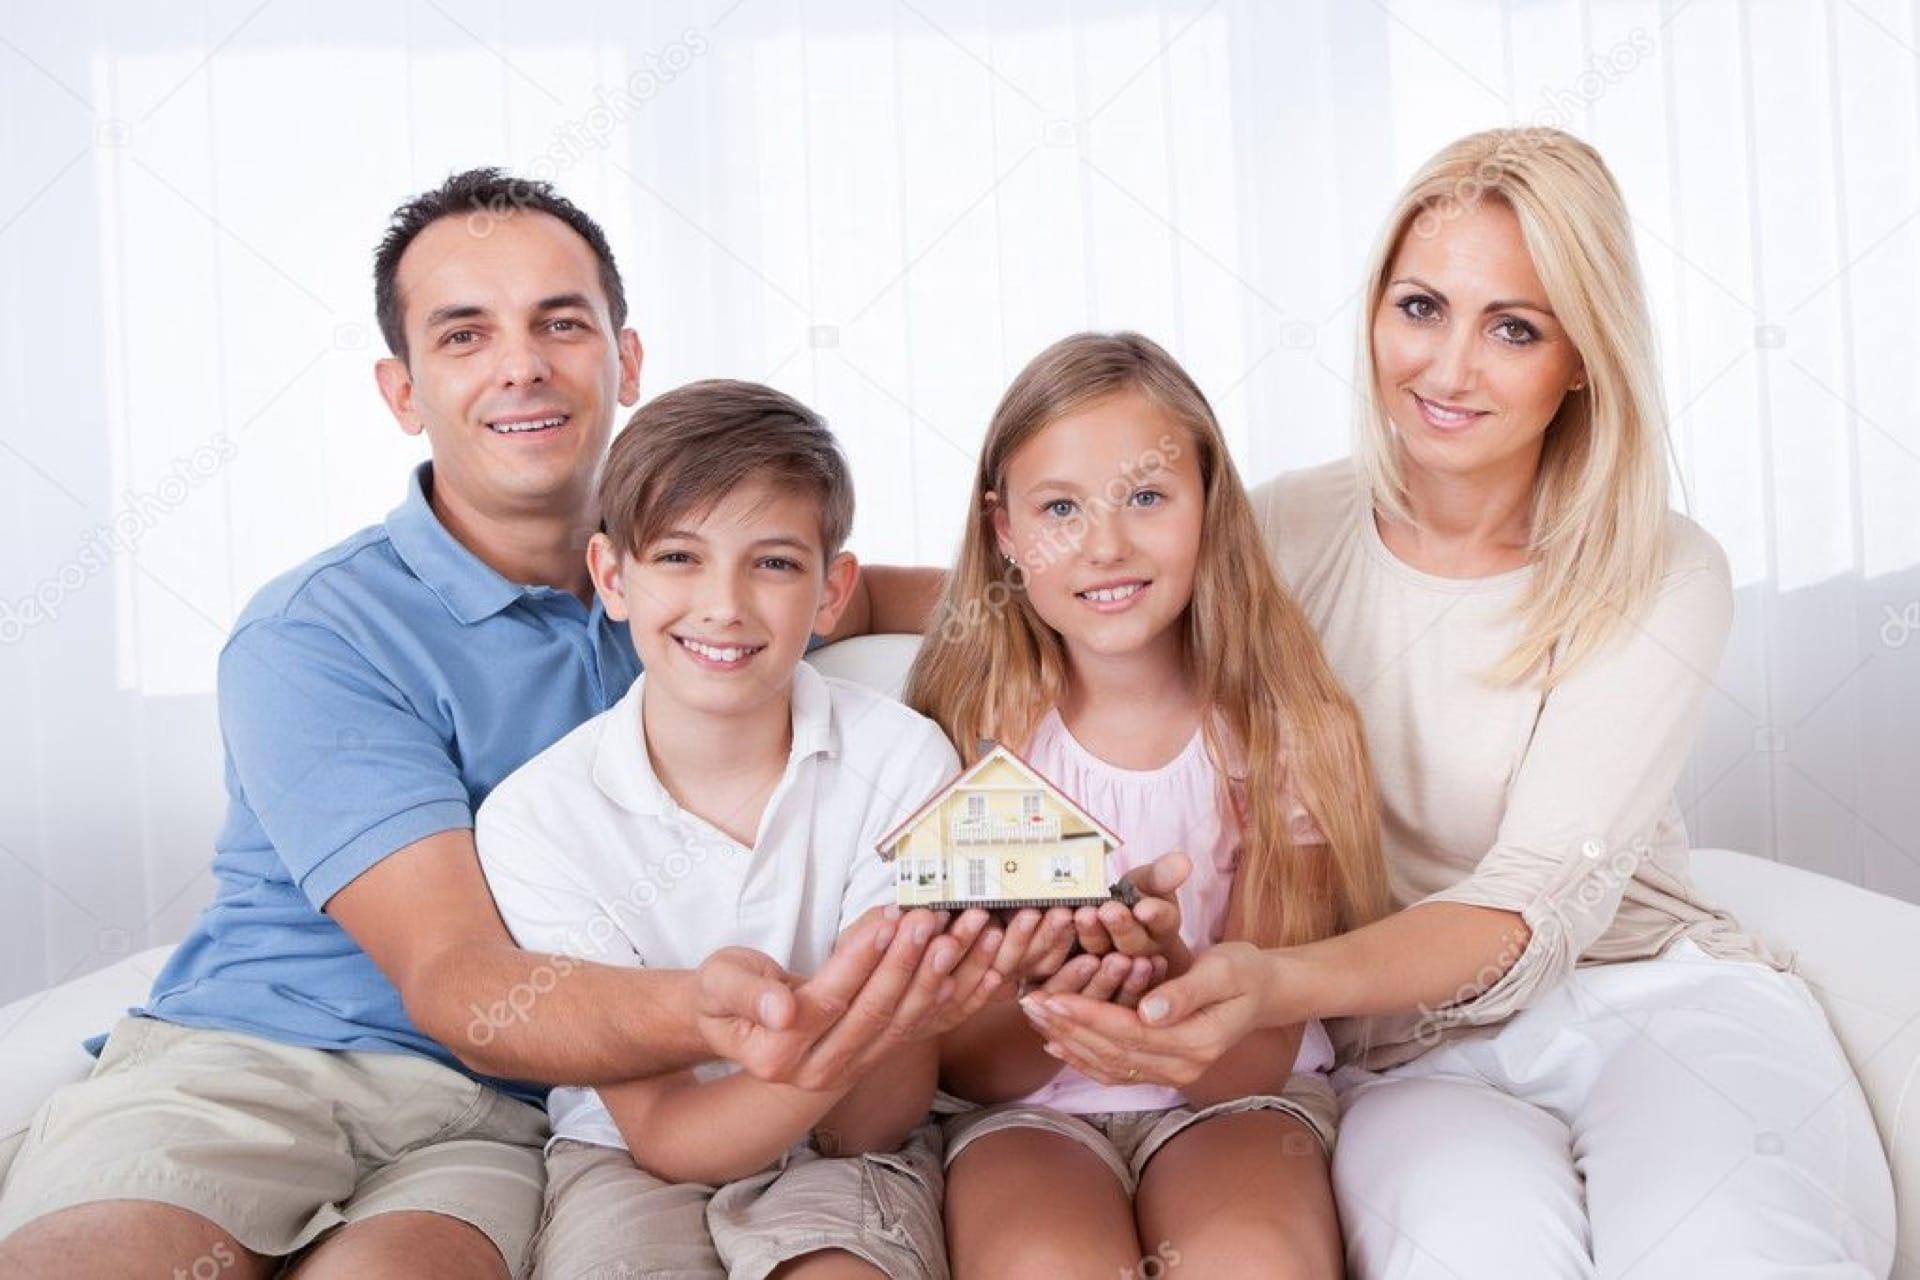 depositphotos_13470361-stock-photo-family-sitting-holding-miniature-model